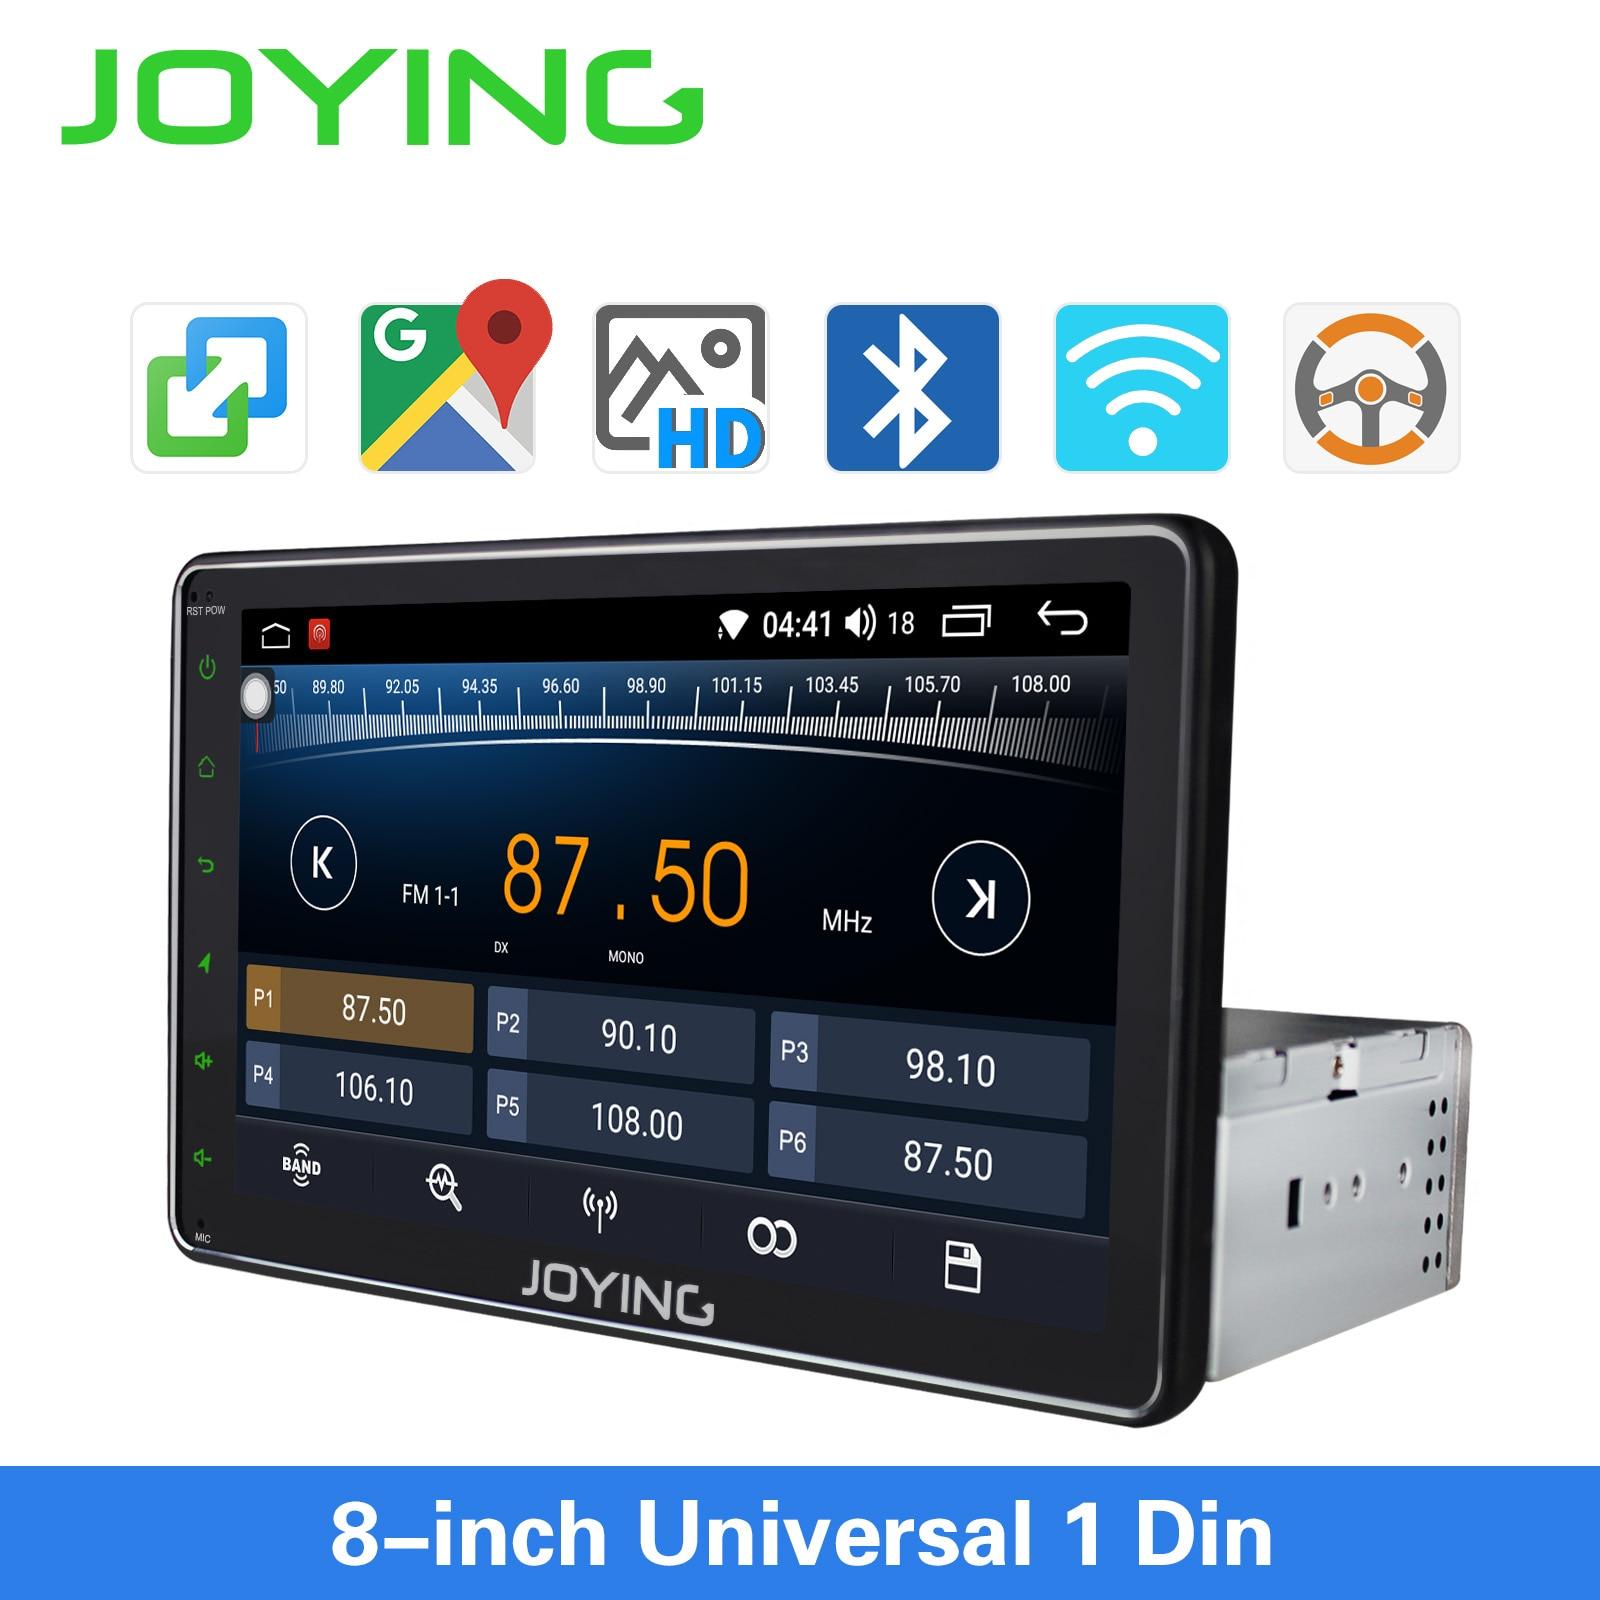 JOYING Single Din Universal Car Radio 8 Inch IPS Screen Autoradio Head Unit GPS Suport Mirror Link& Fast Boot&s*back Up Camera